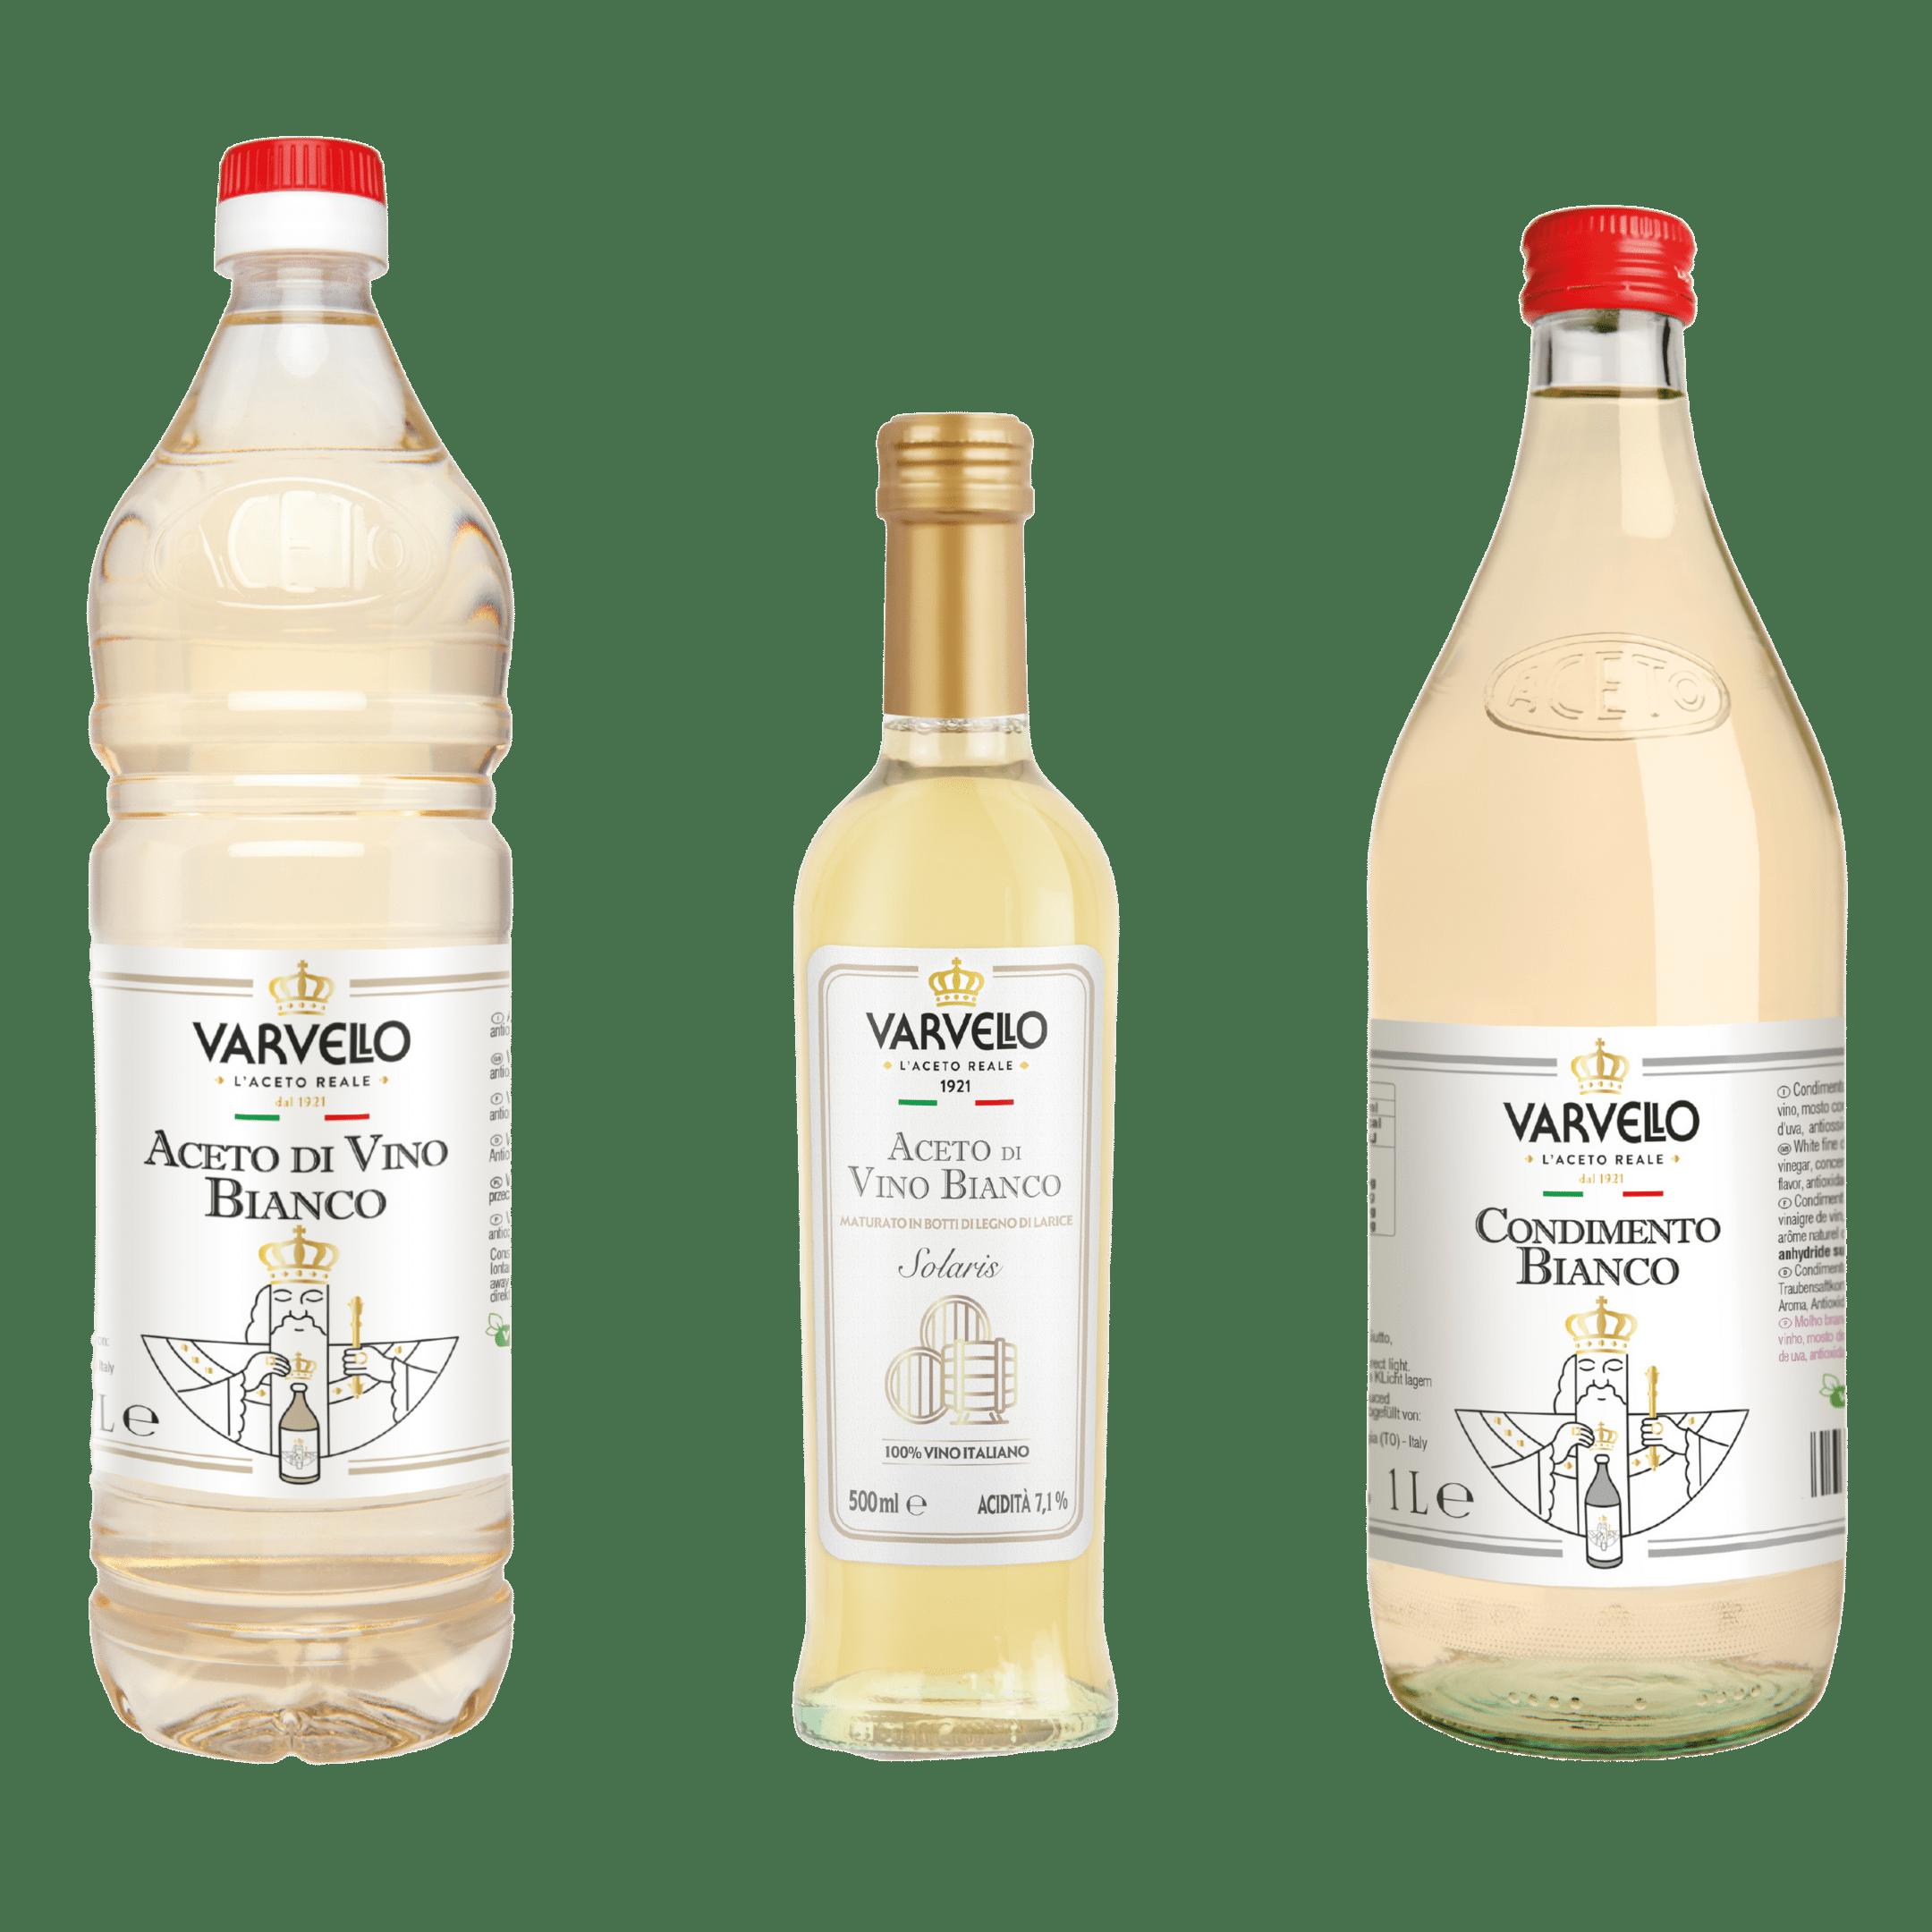 aceti di vino bianco Varvello